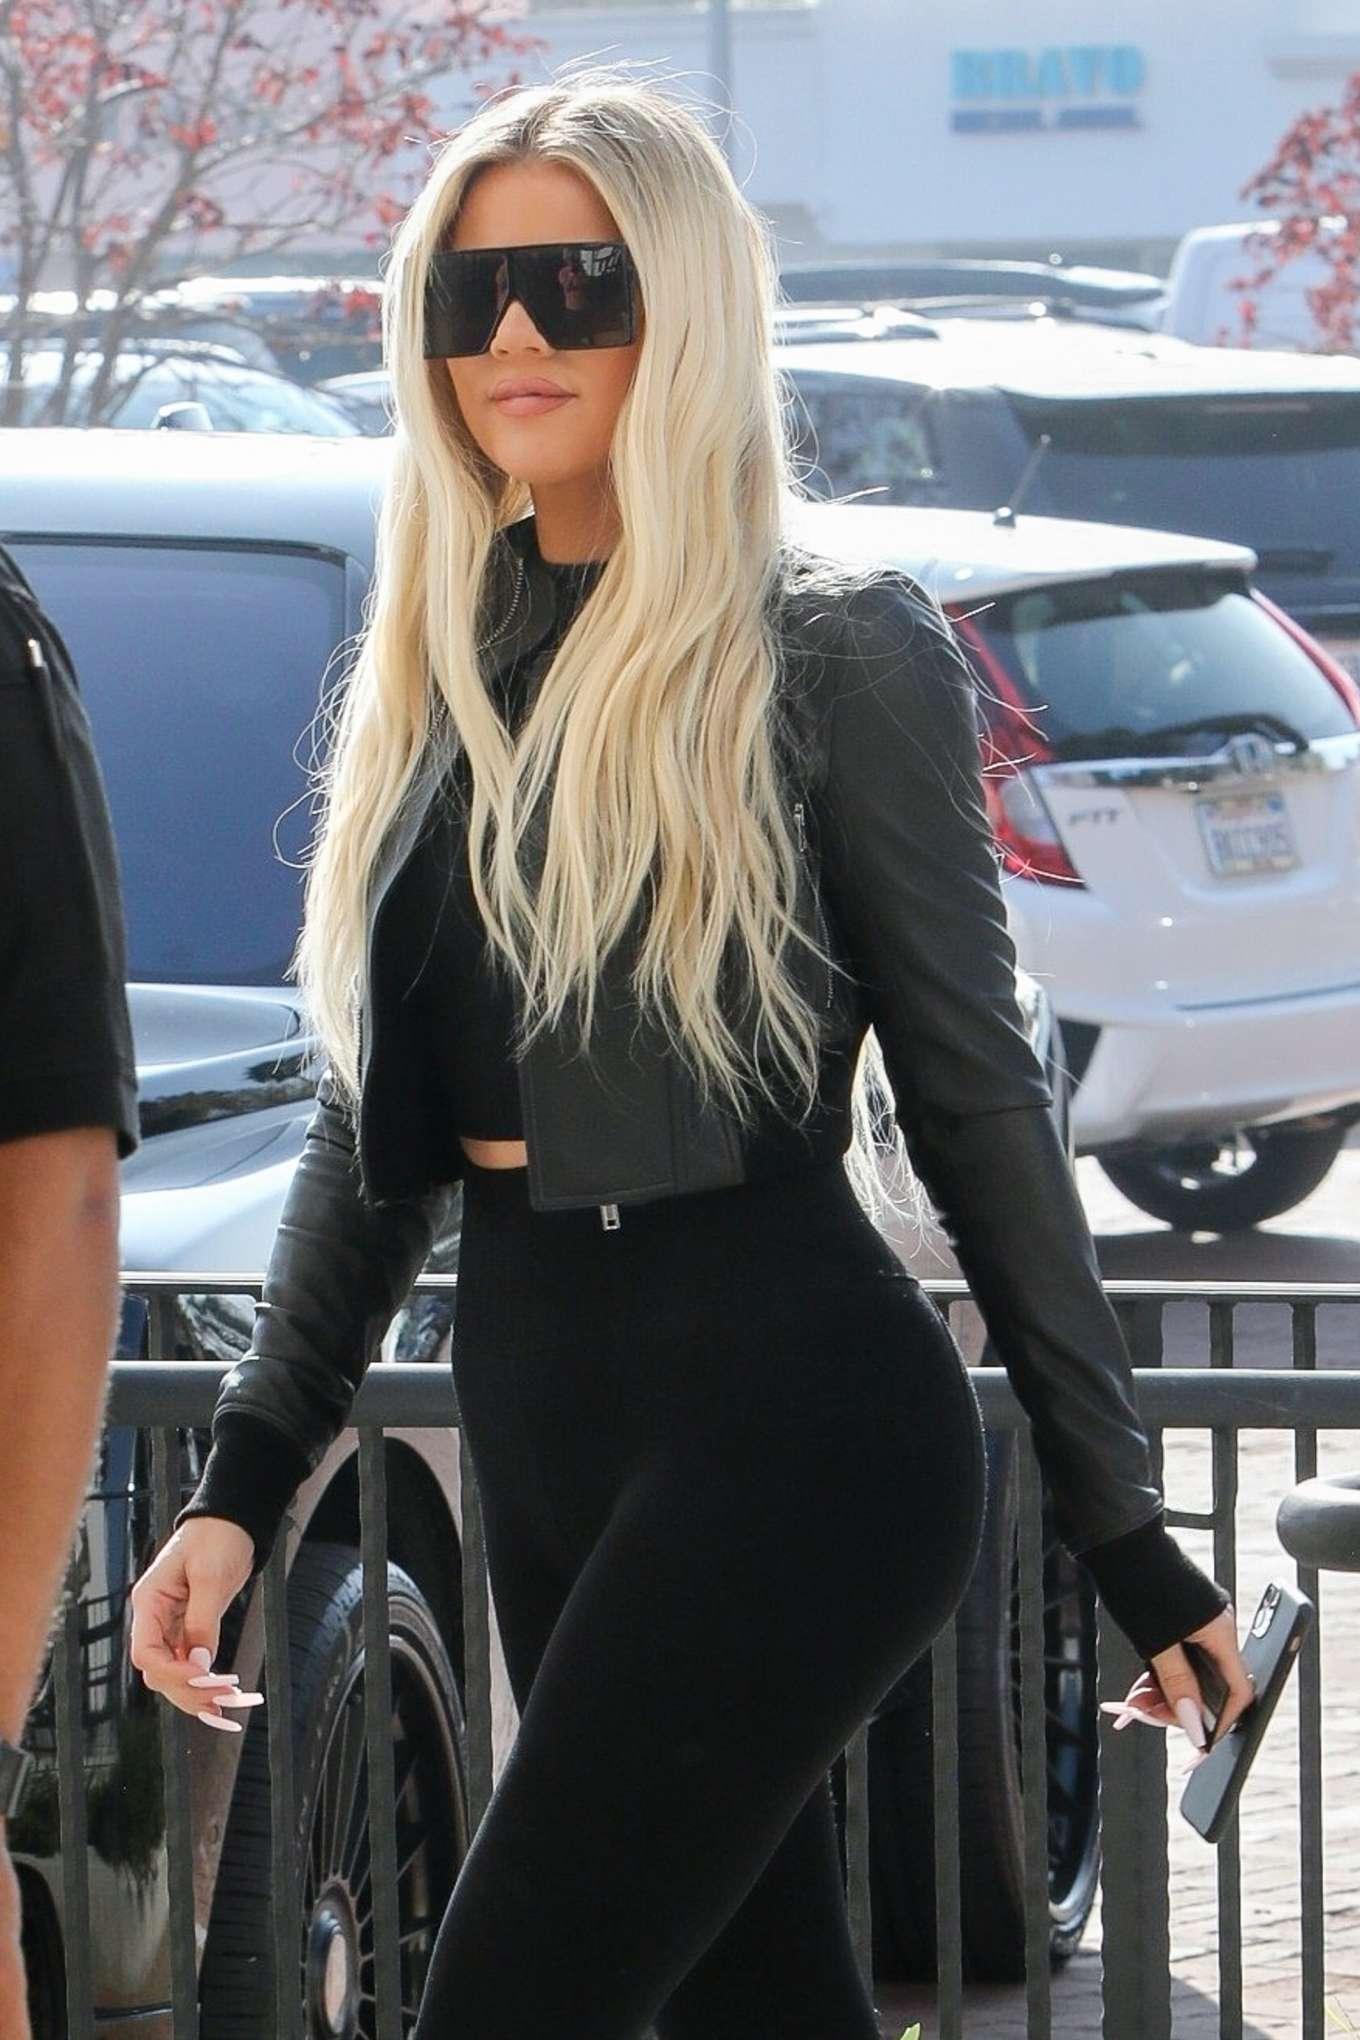 Khloe Kardashian 2019 : Khloe Kardashian – Shopping at Toy Crazy at the Malibu Country Mart-21